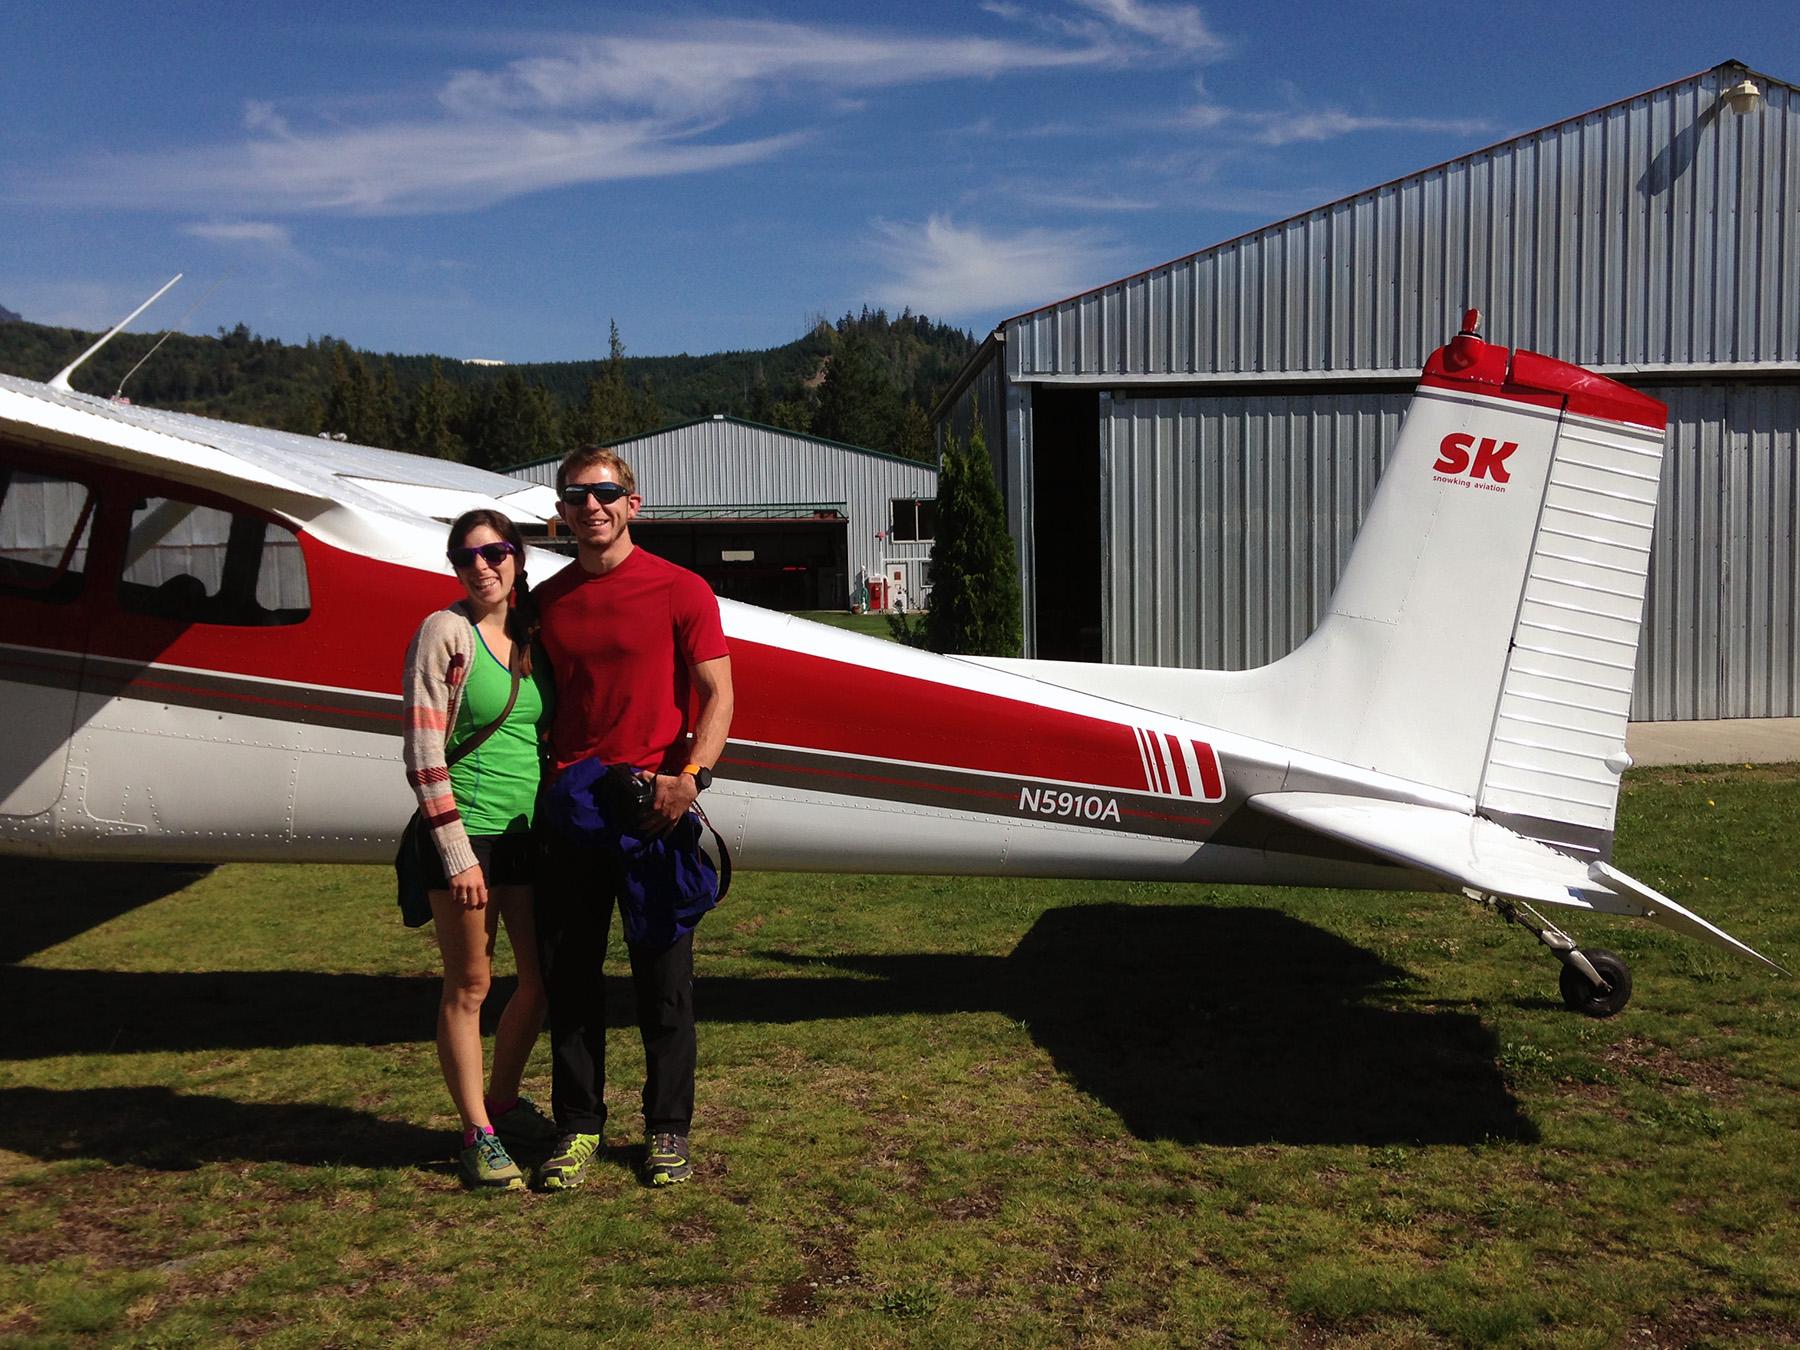 Range of Glaciers Scenic Flight over the North Cascades: Snowking Aviation